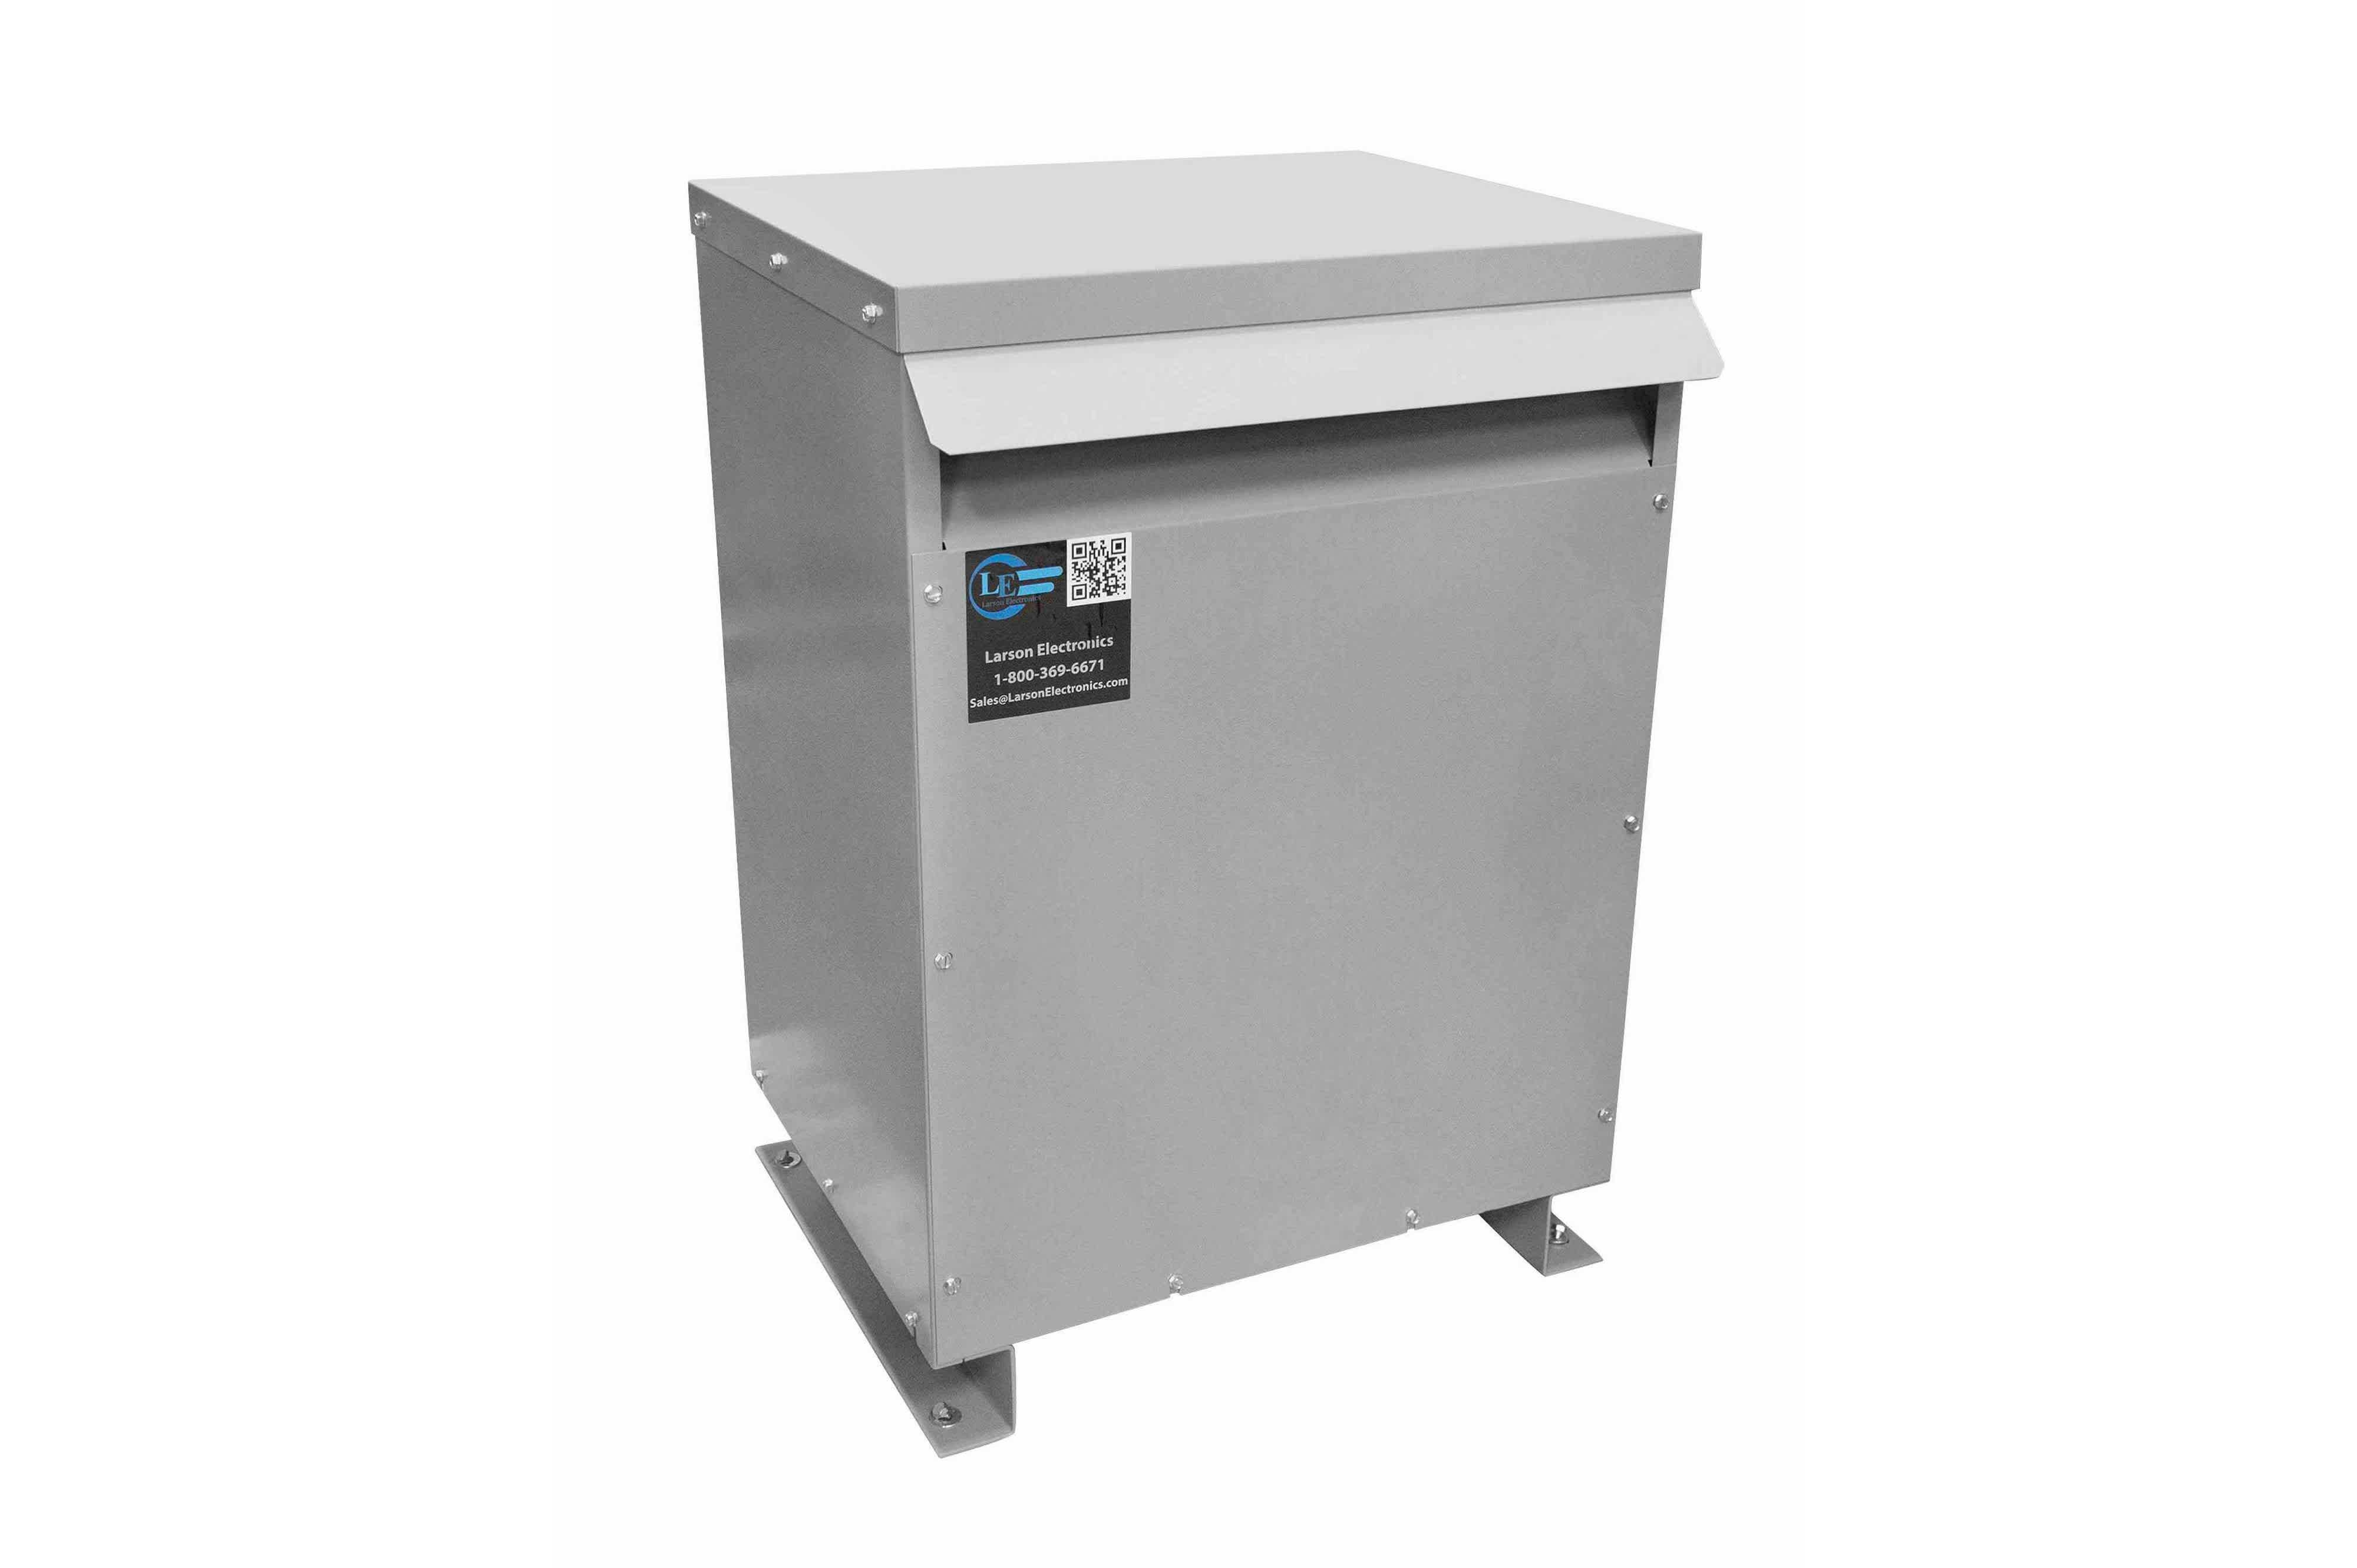 60 kVA 3PH DOE Transformer, 400V Delta Primary, 208Y/120 Wye-N Secondary, N3R, Ventilated, 60 Hz